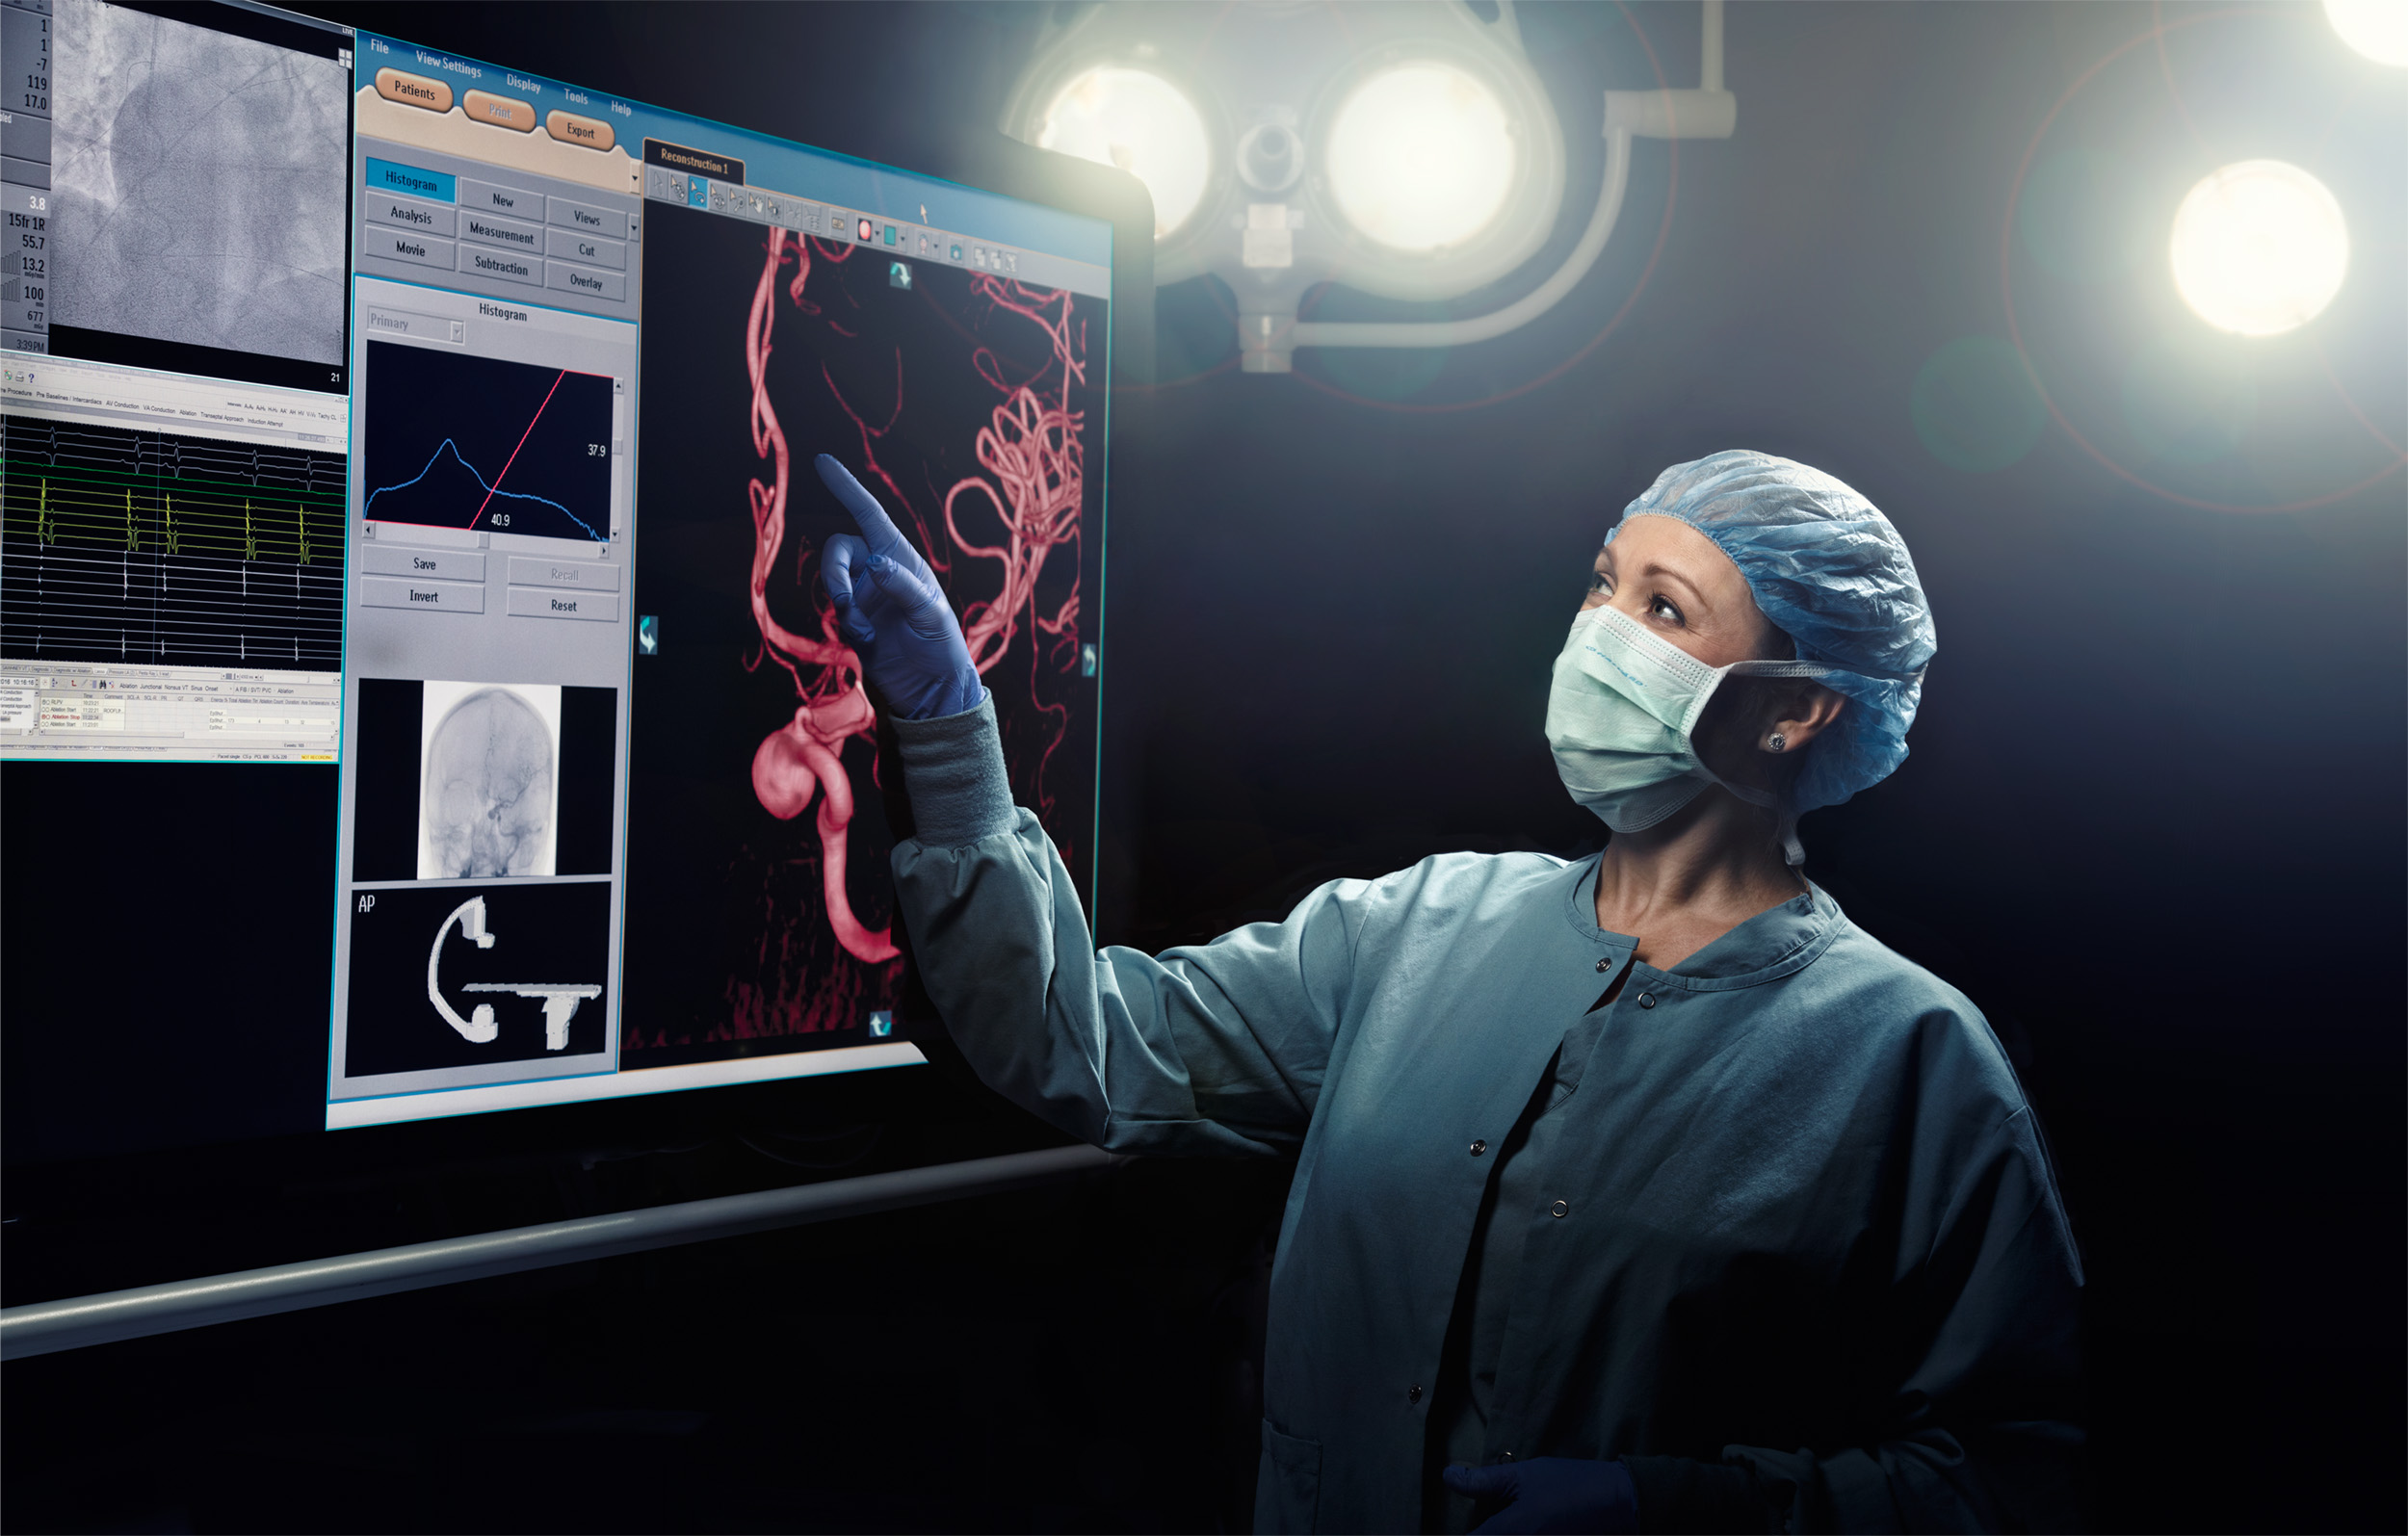 31_healthcare_insurance_hospital_photography.jpg